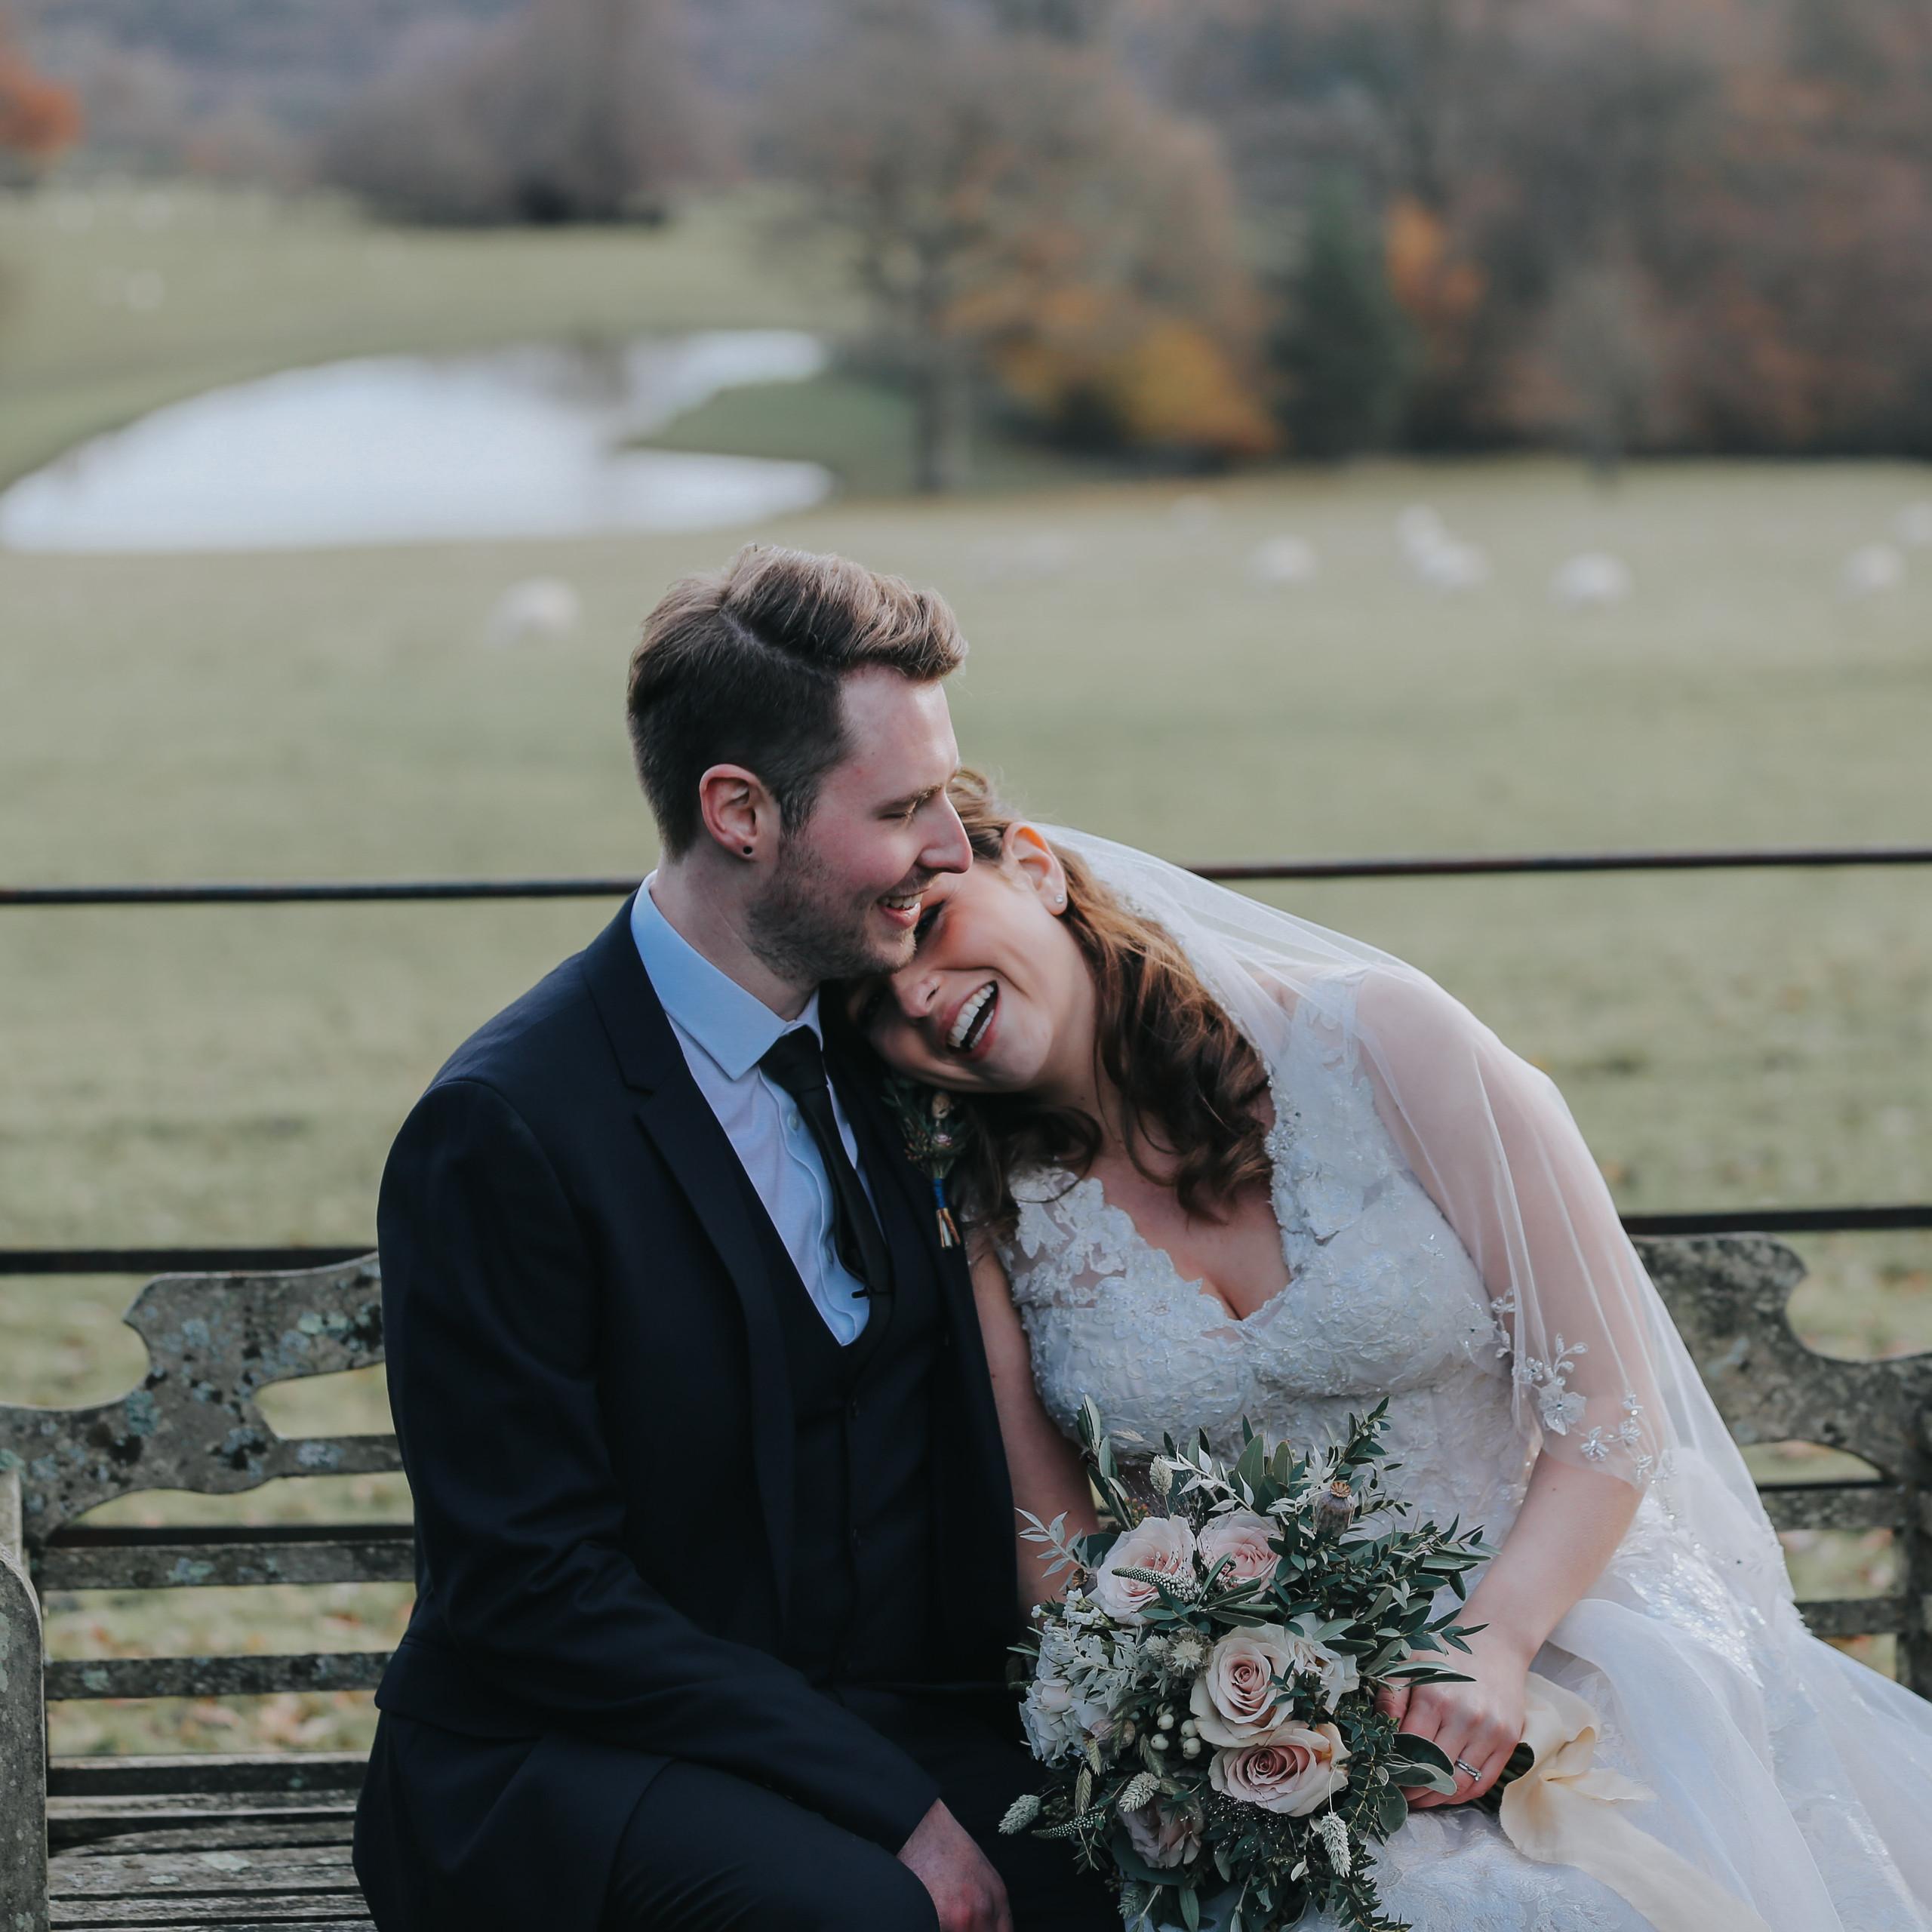 Bride laughs and leans into grroms shoulder at wedding at Wadhurst Castle